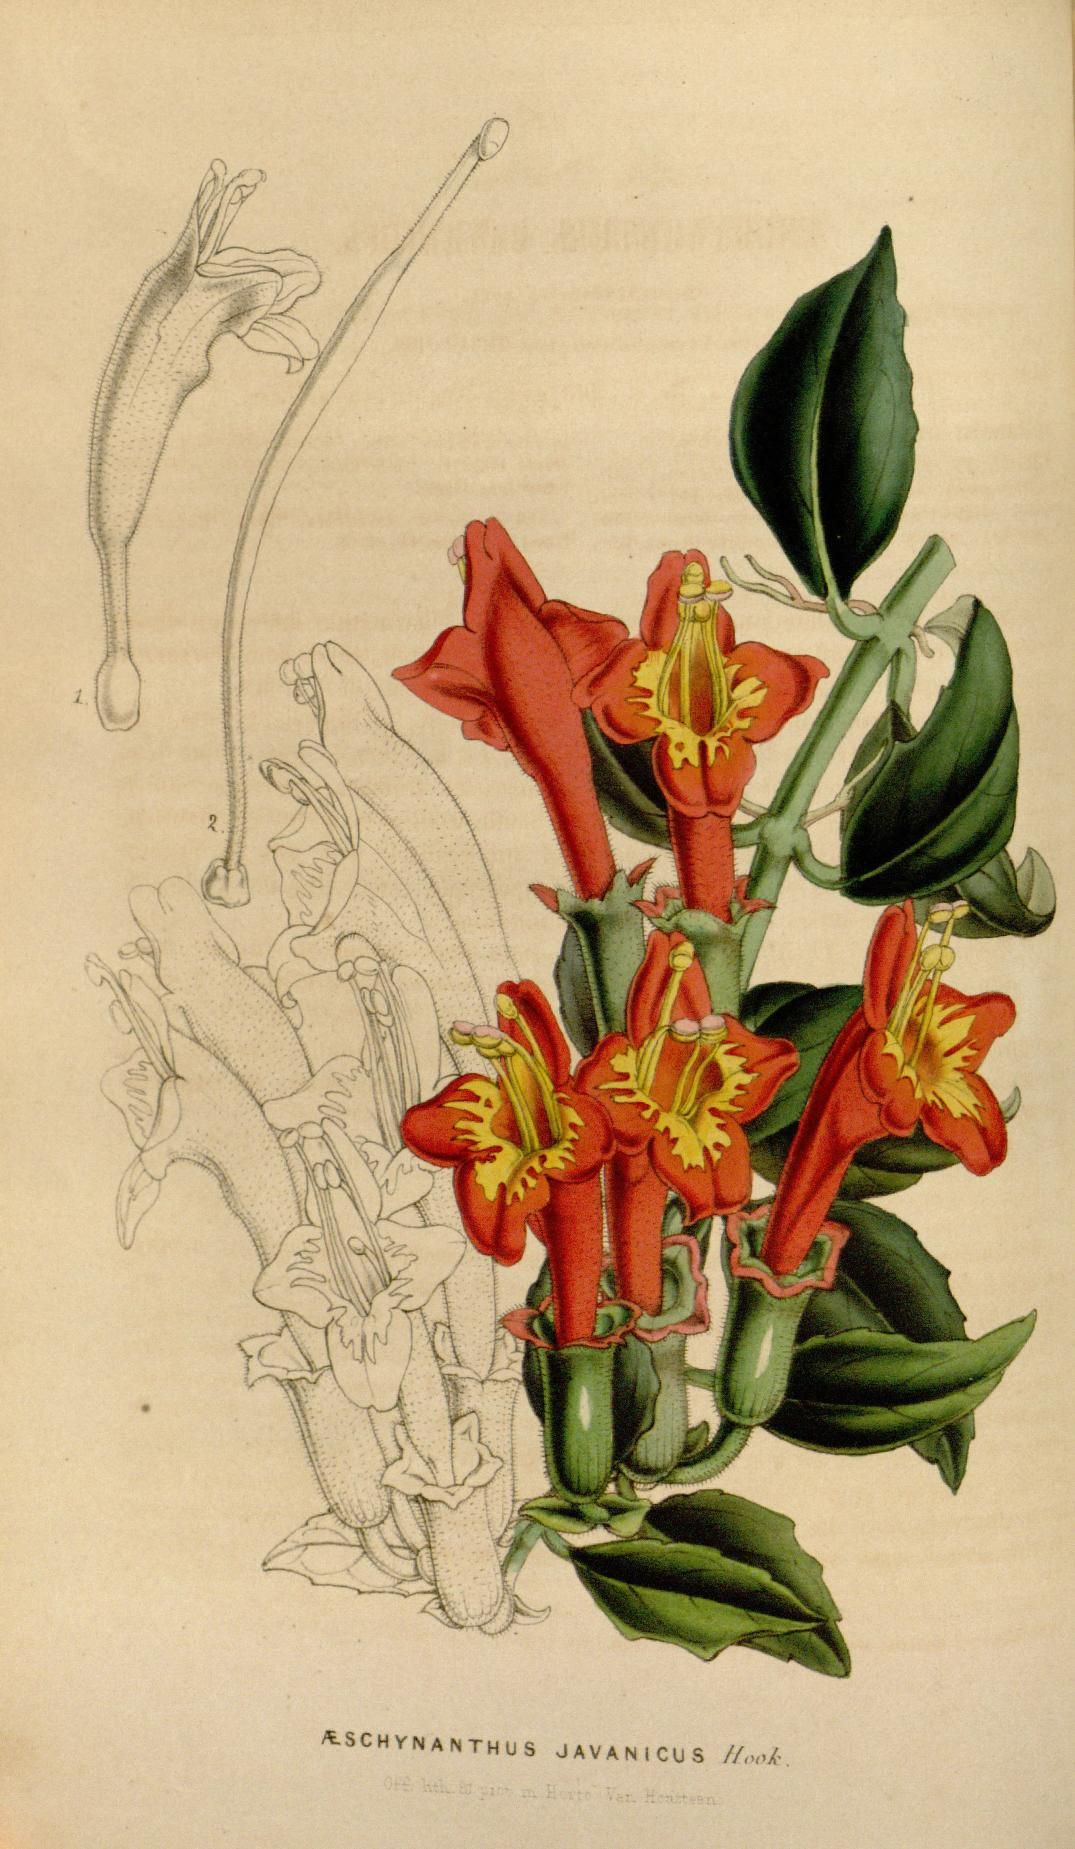 Æschynanthus javanicus